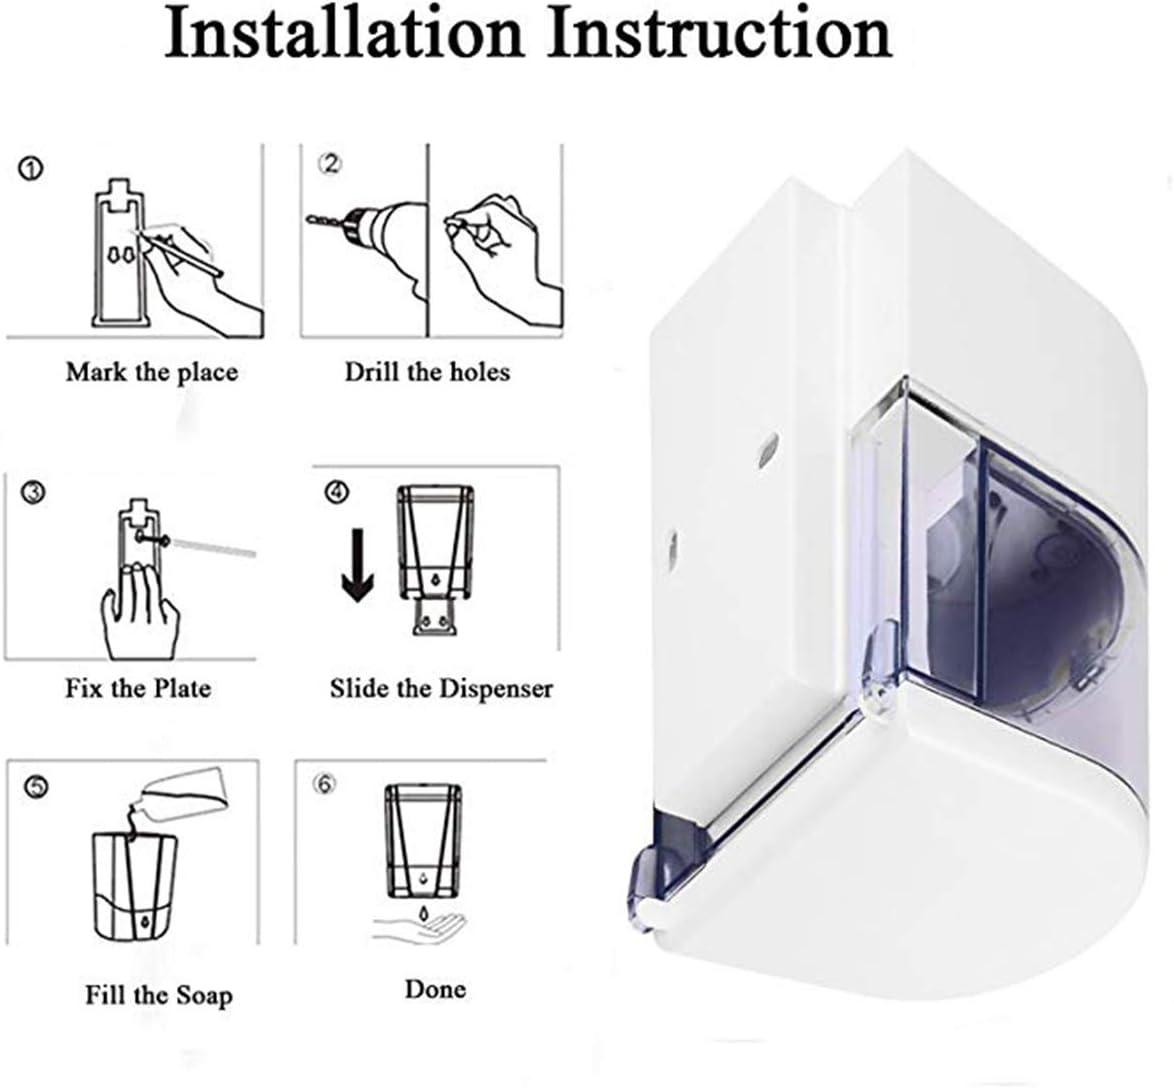 Automatic Soap Dispenser Sunsbell Wall-Mounted Sensor Soap Dispenser - Battery Powered Senor Pump for Kitchen/Bathroom (600ML-S01): Home & Kitchen